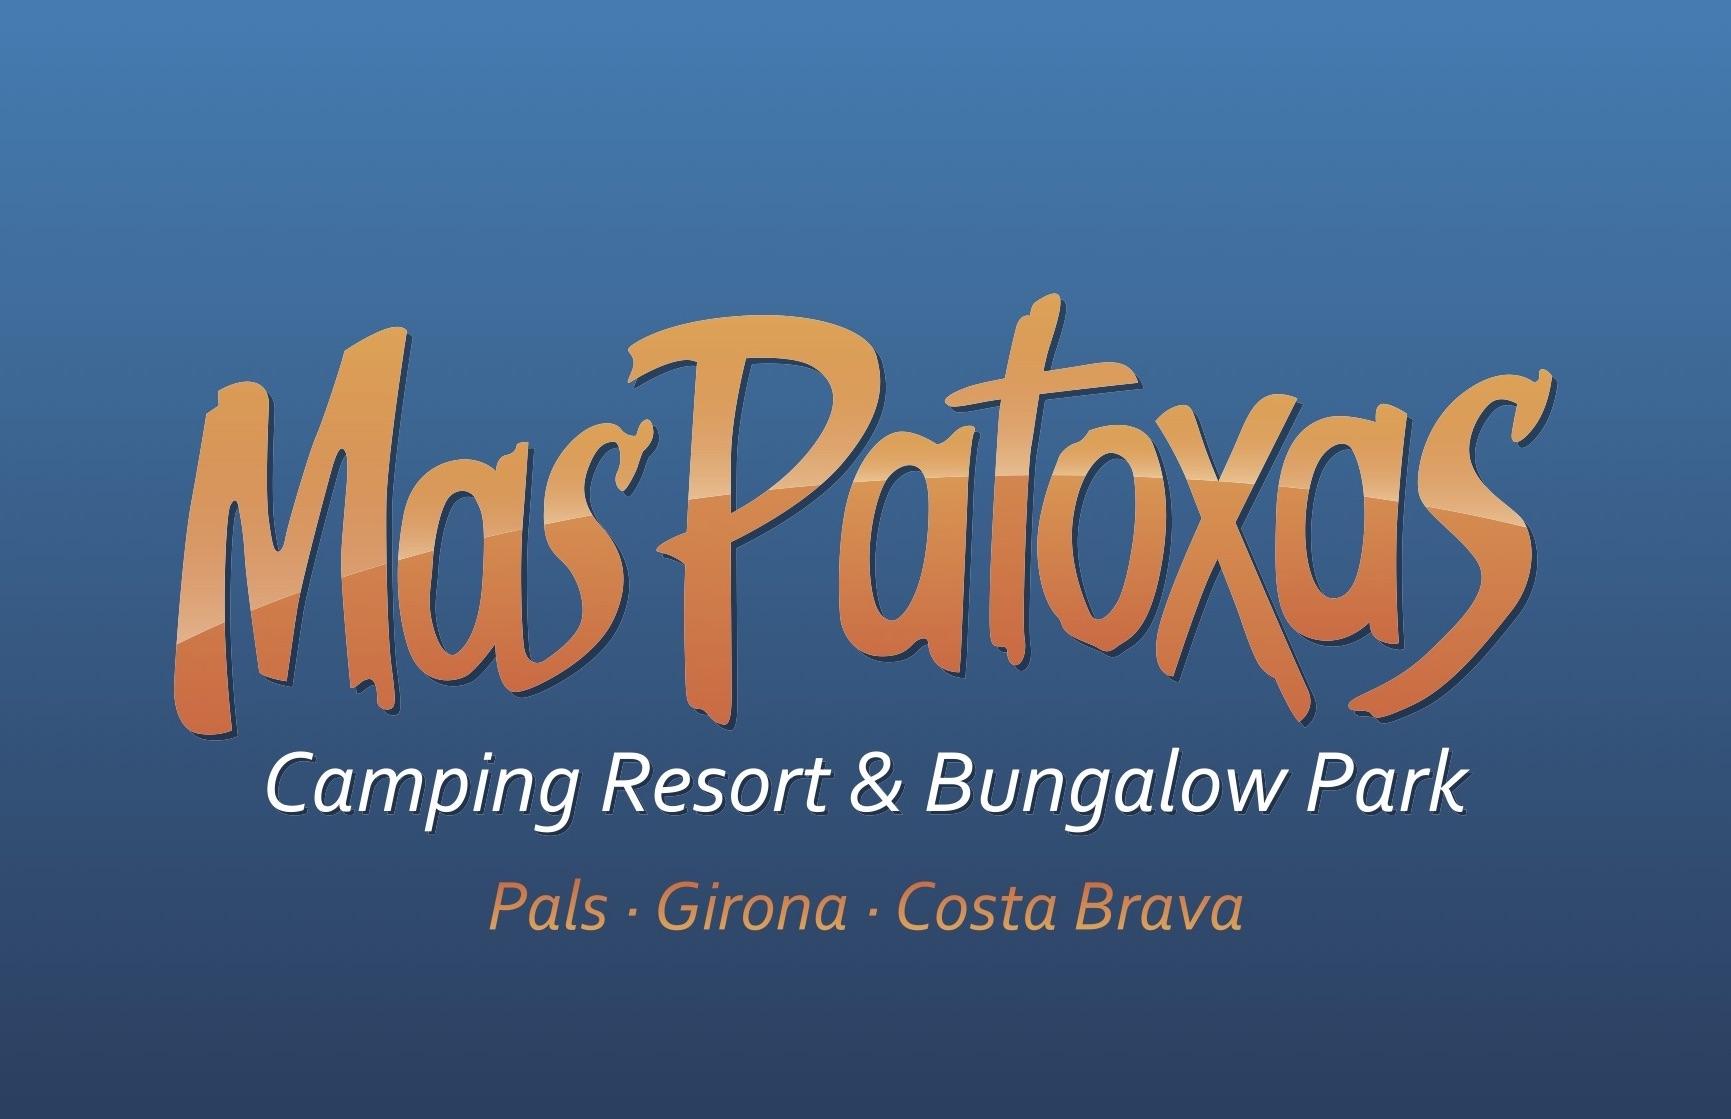 Camping Resort Bungalow Park  Mas Patoxas